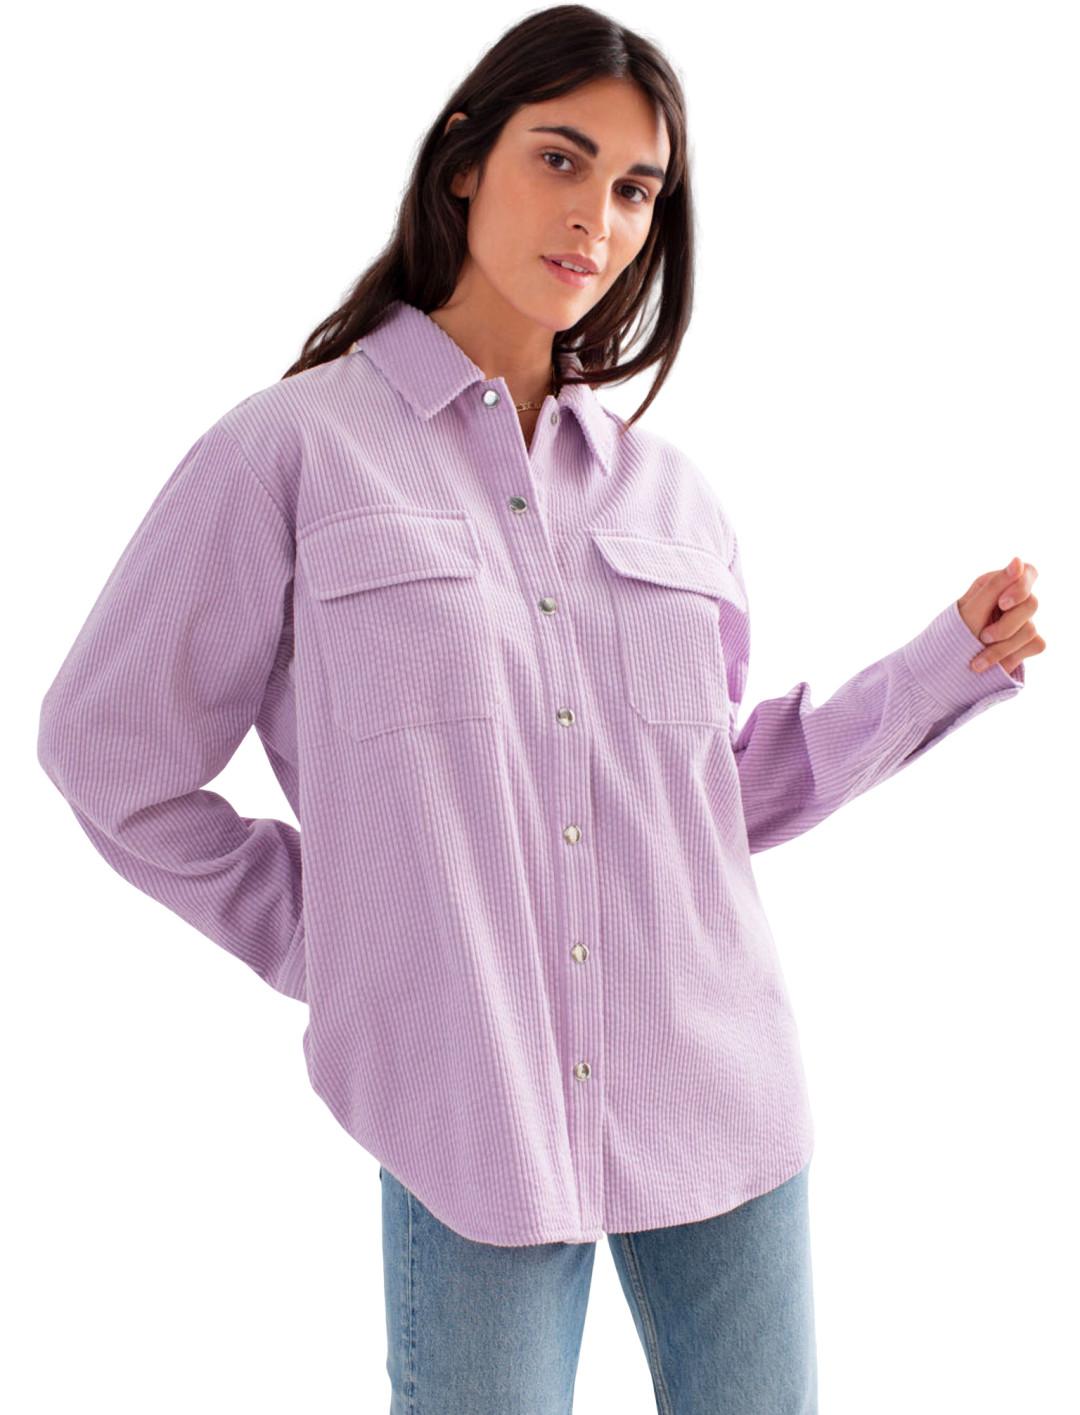 Corduroy Shirt Clothing